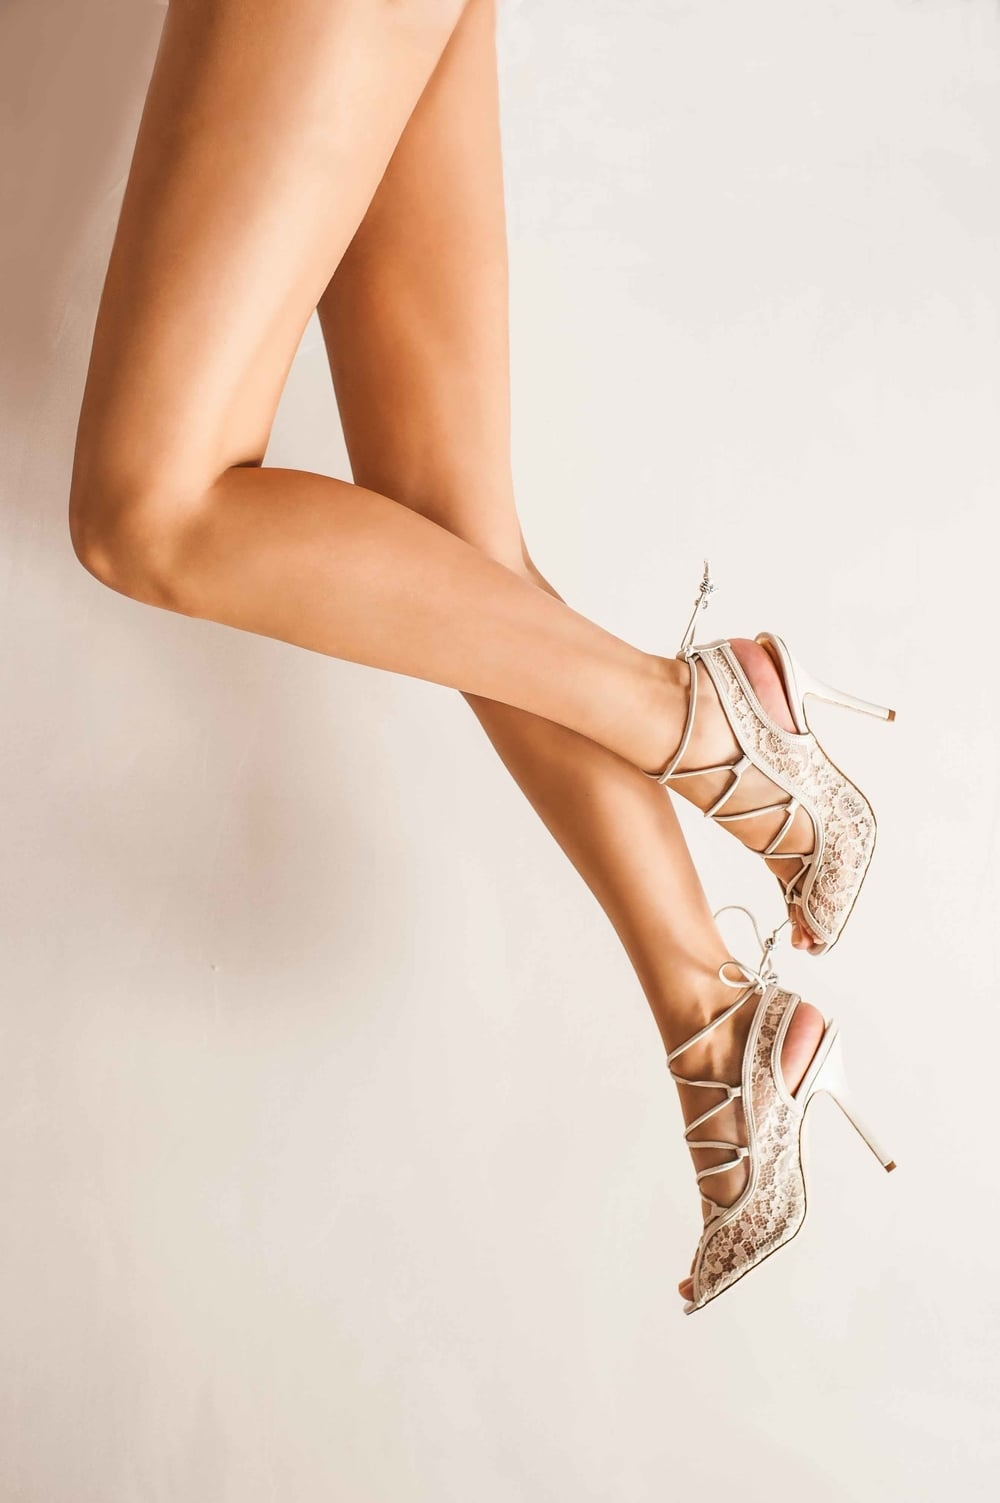 Freya Rose new Legs SM size-10.jpg